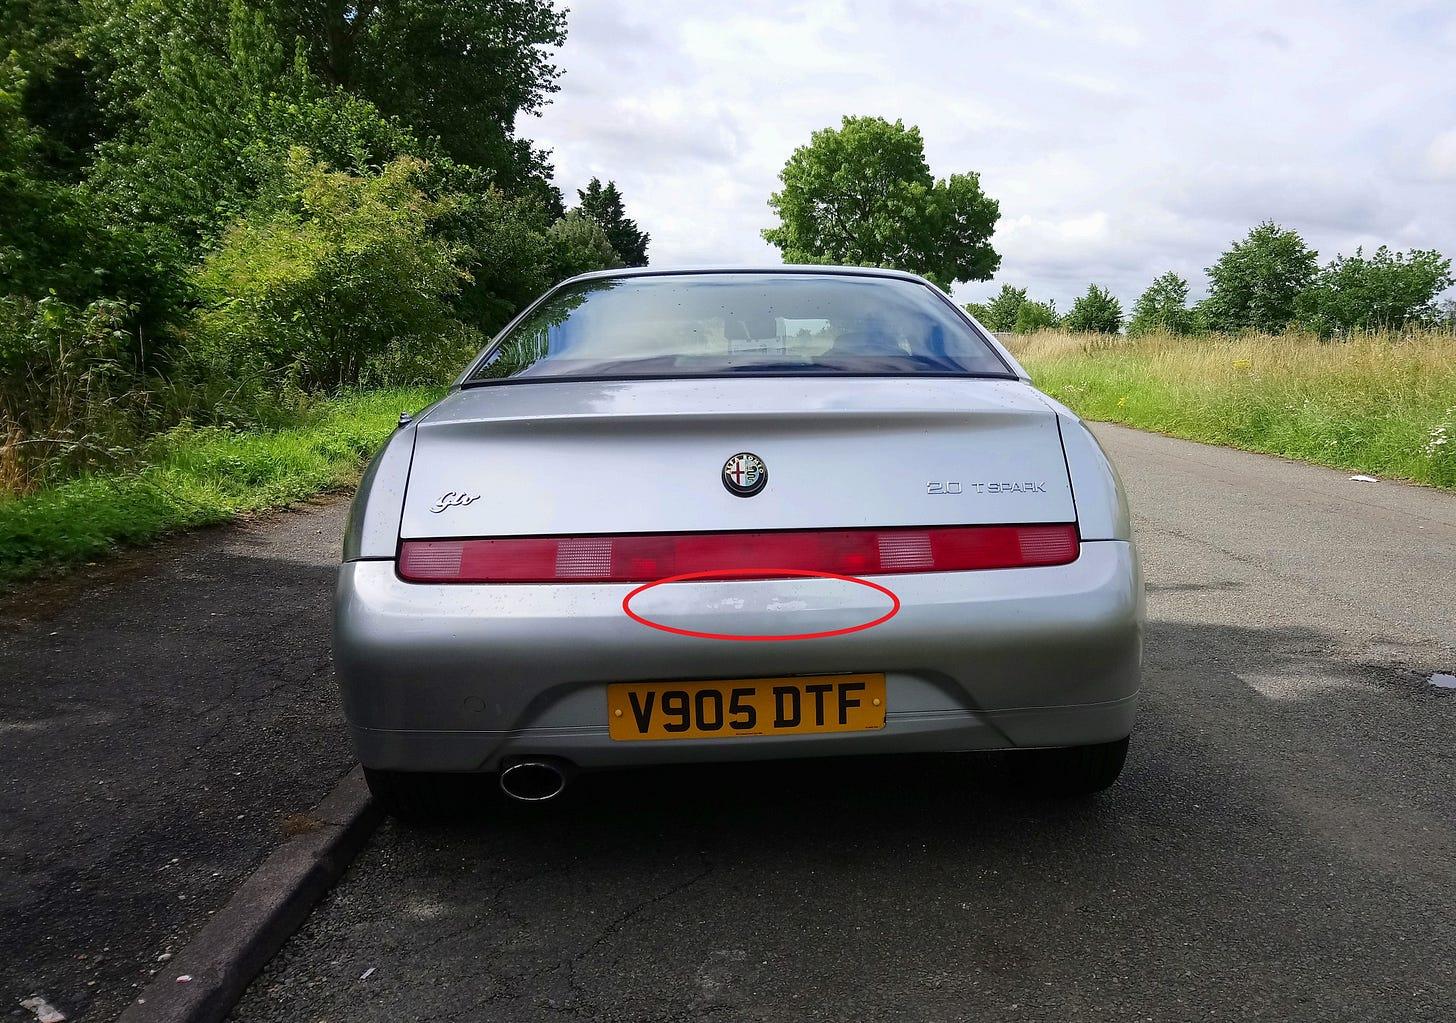 Alf's rear bumper lacquer peel